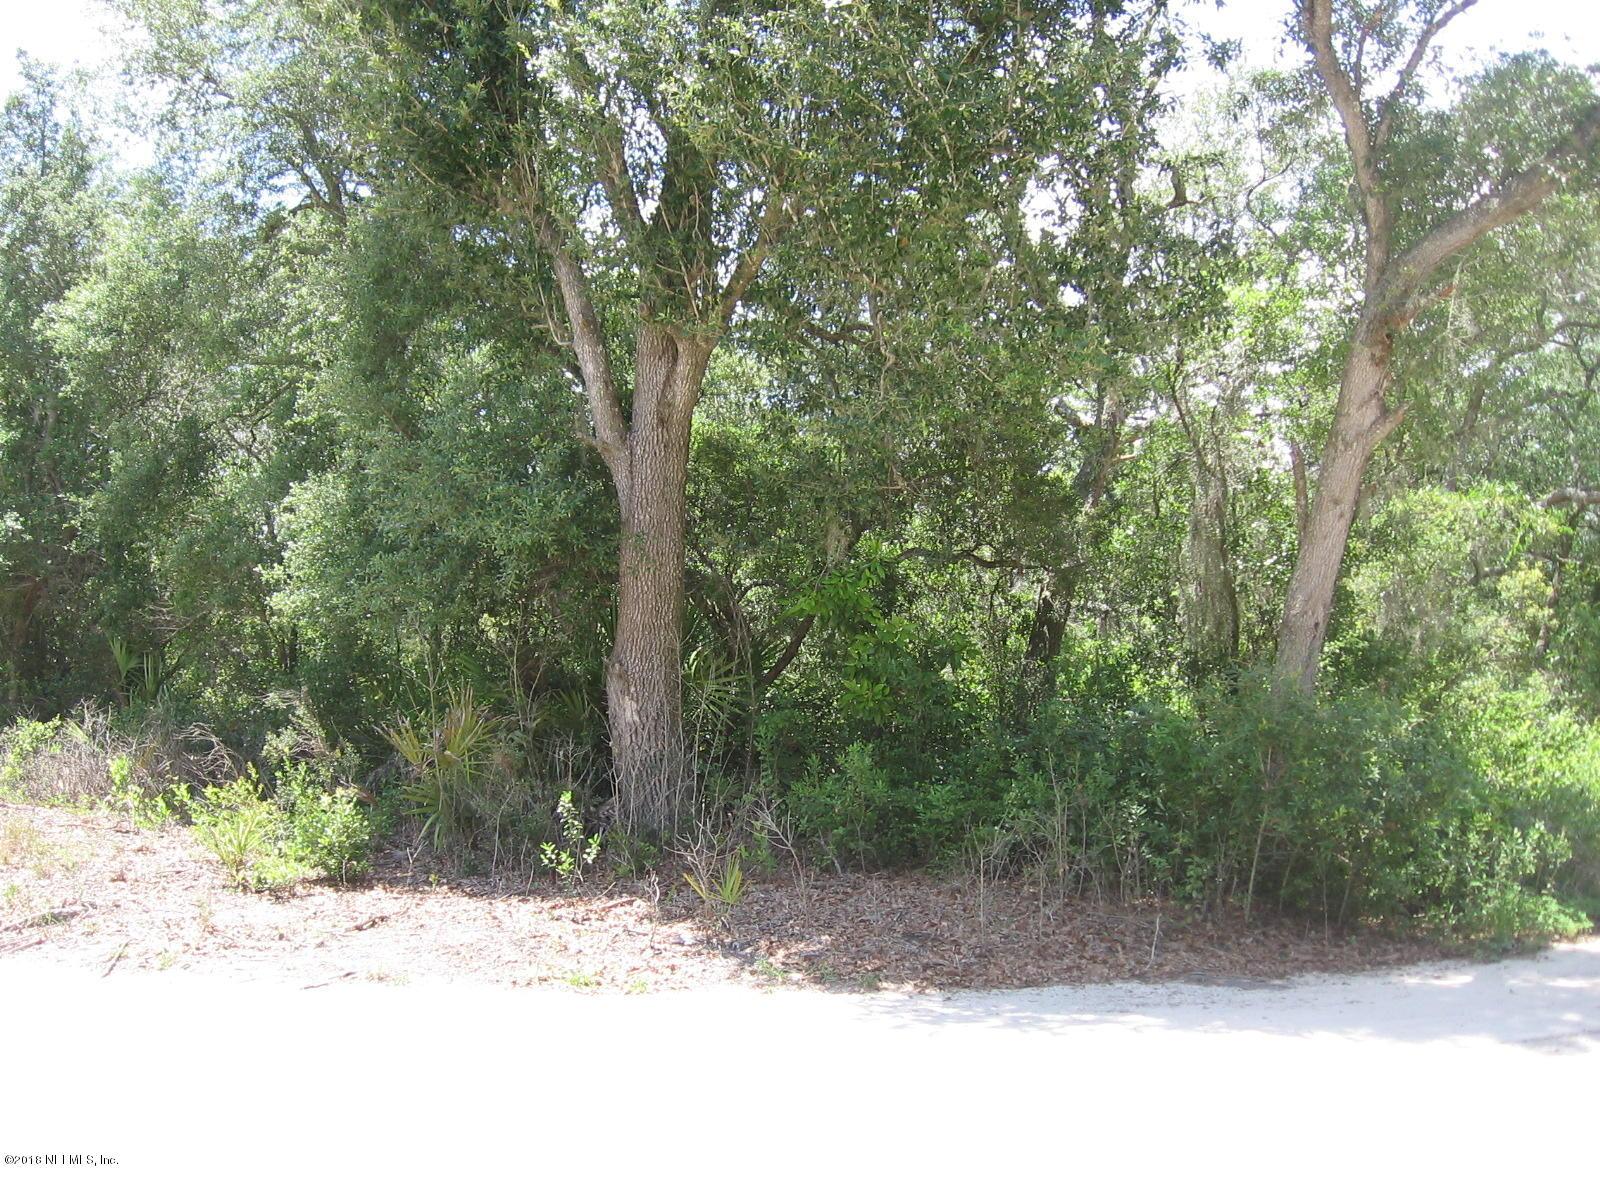 0 BILLS, KEYSTONE HEIGHTS, FLORIDA 32656, ,Vacant land,For sale,BILLS,939420